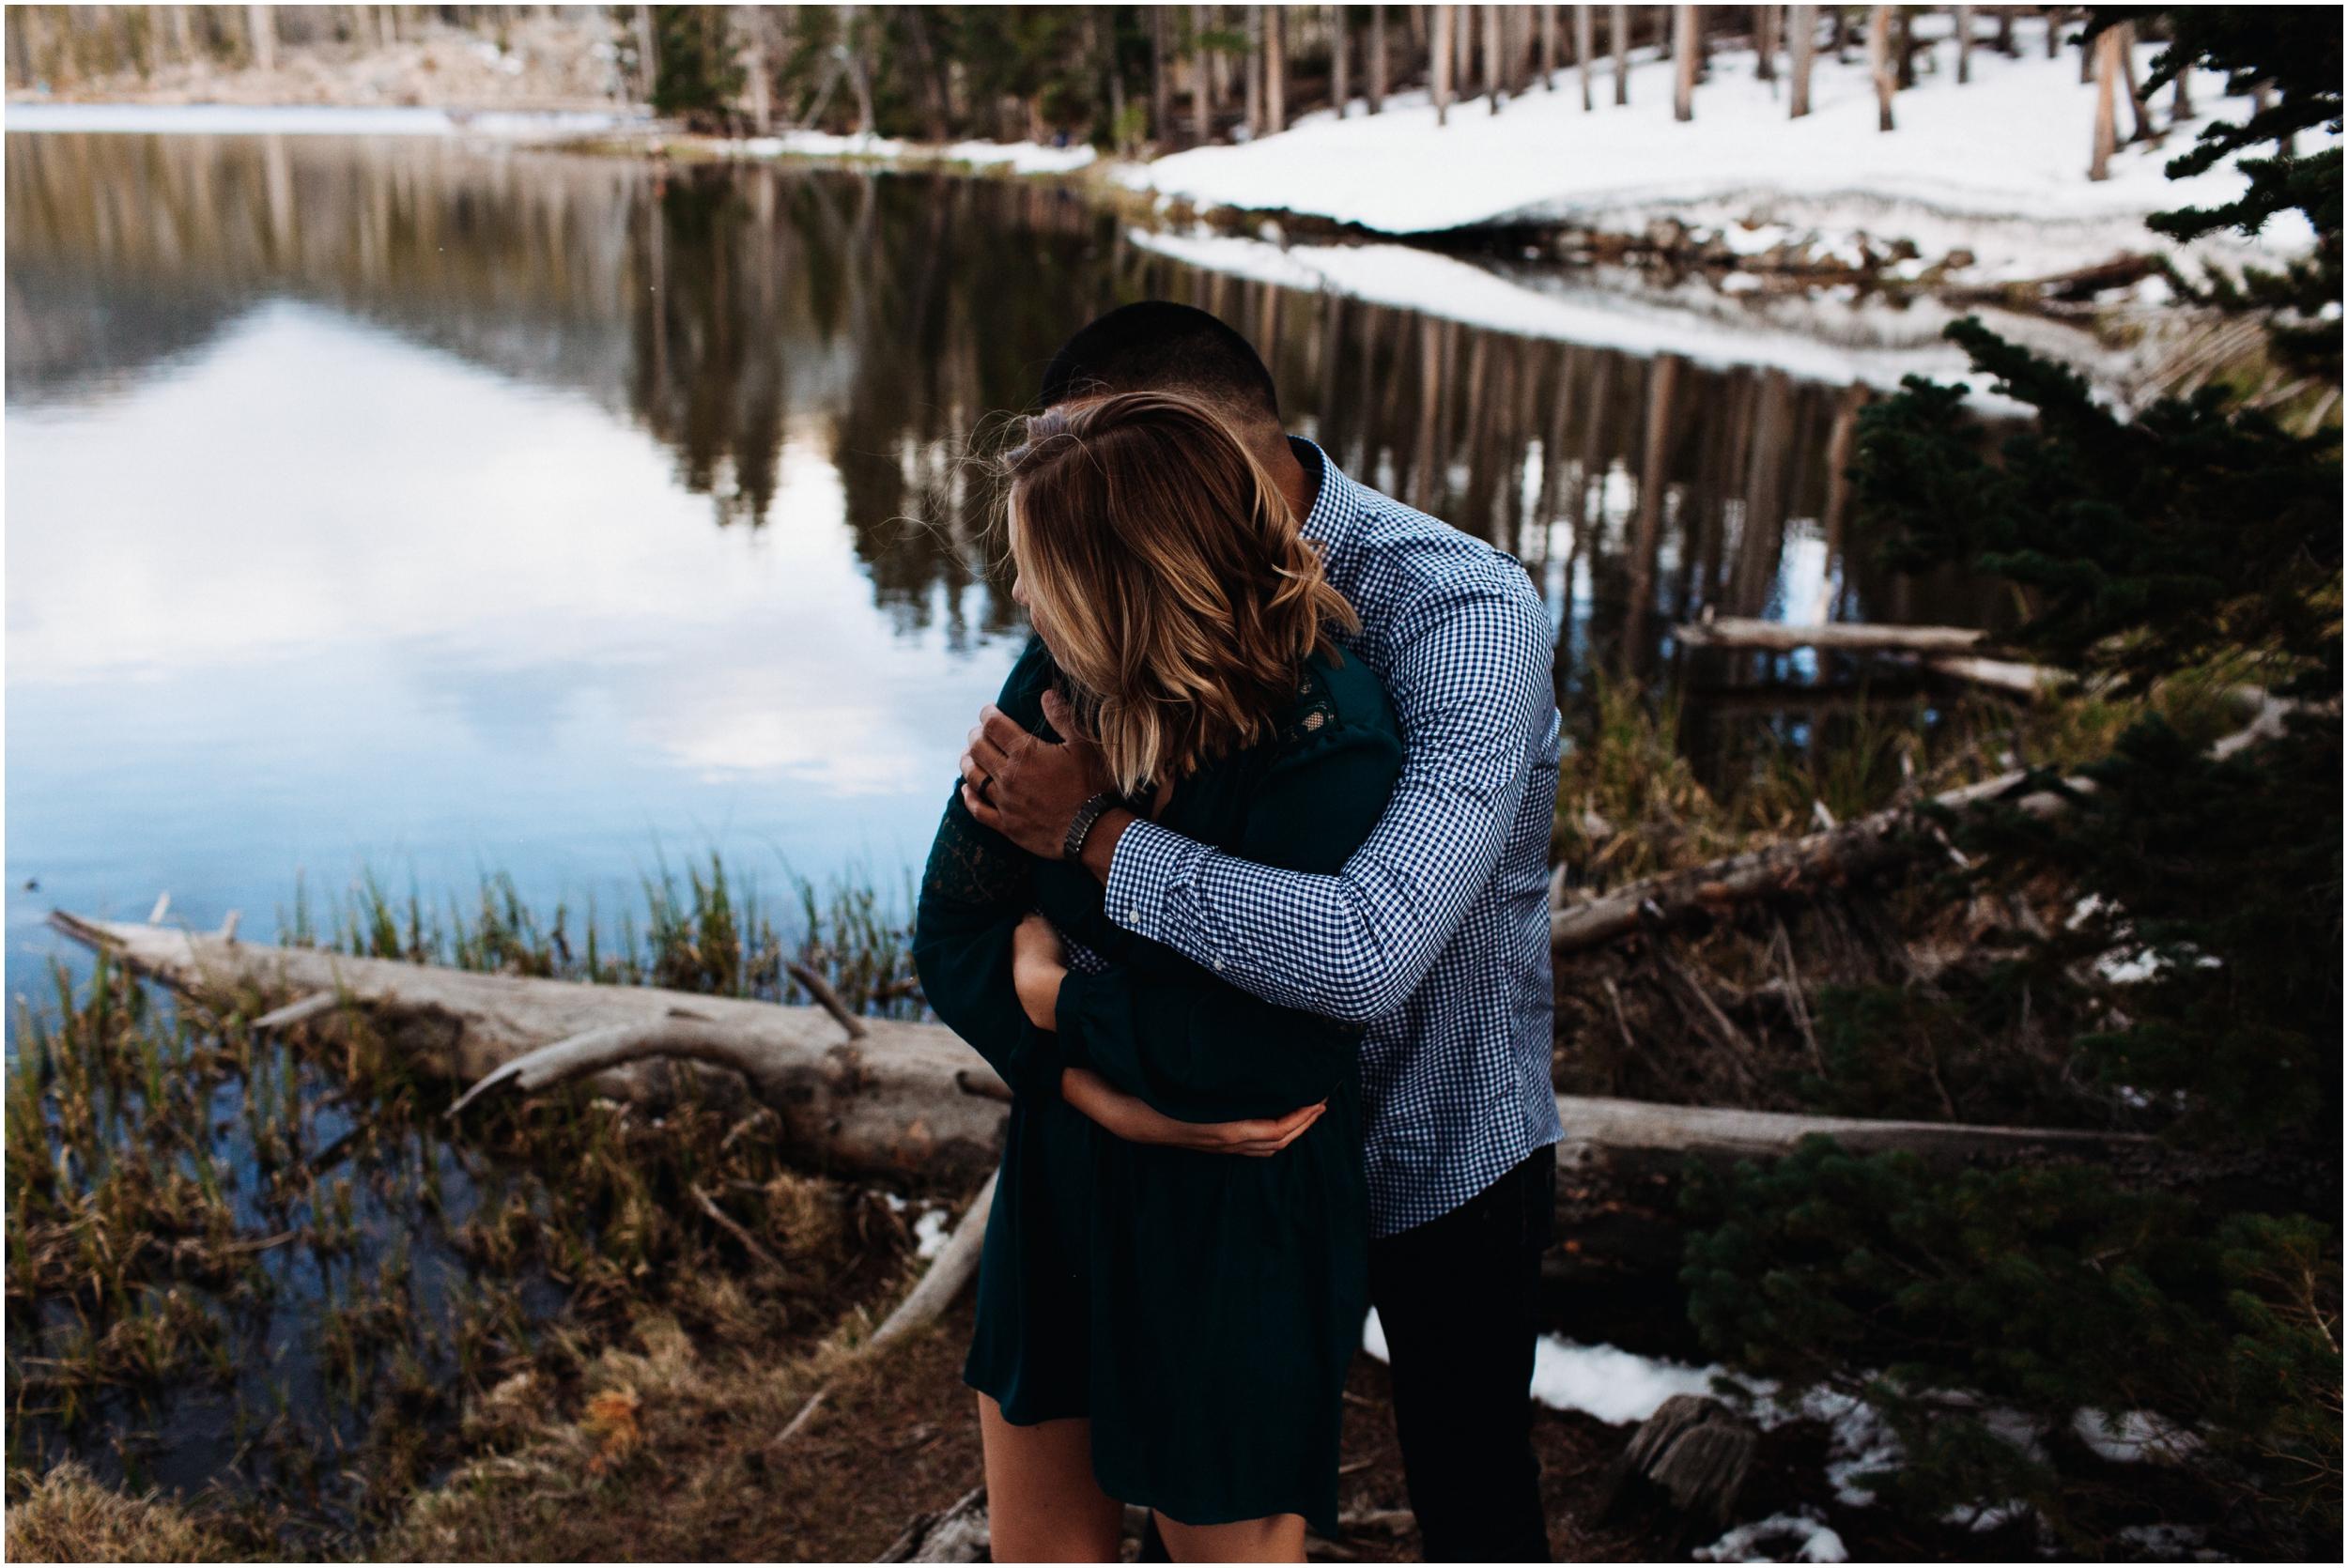 rocky-mountain-national-park-elopement-sprague-lake-colorado-adventure-wedding-photographer_taylor-powers_173.jpg